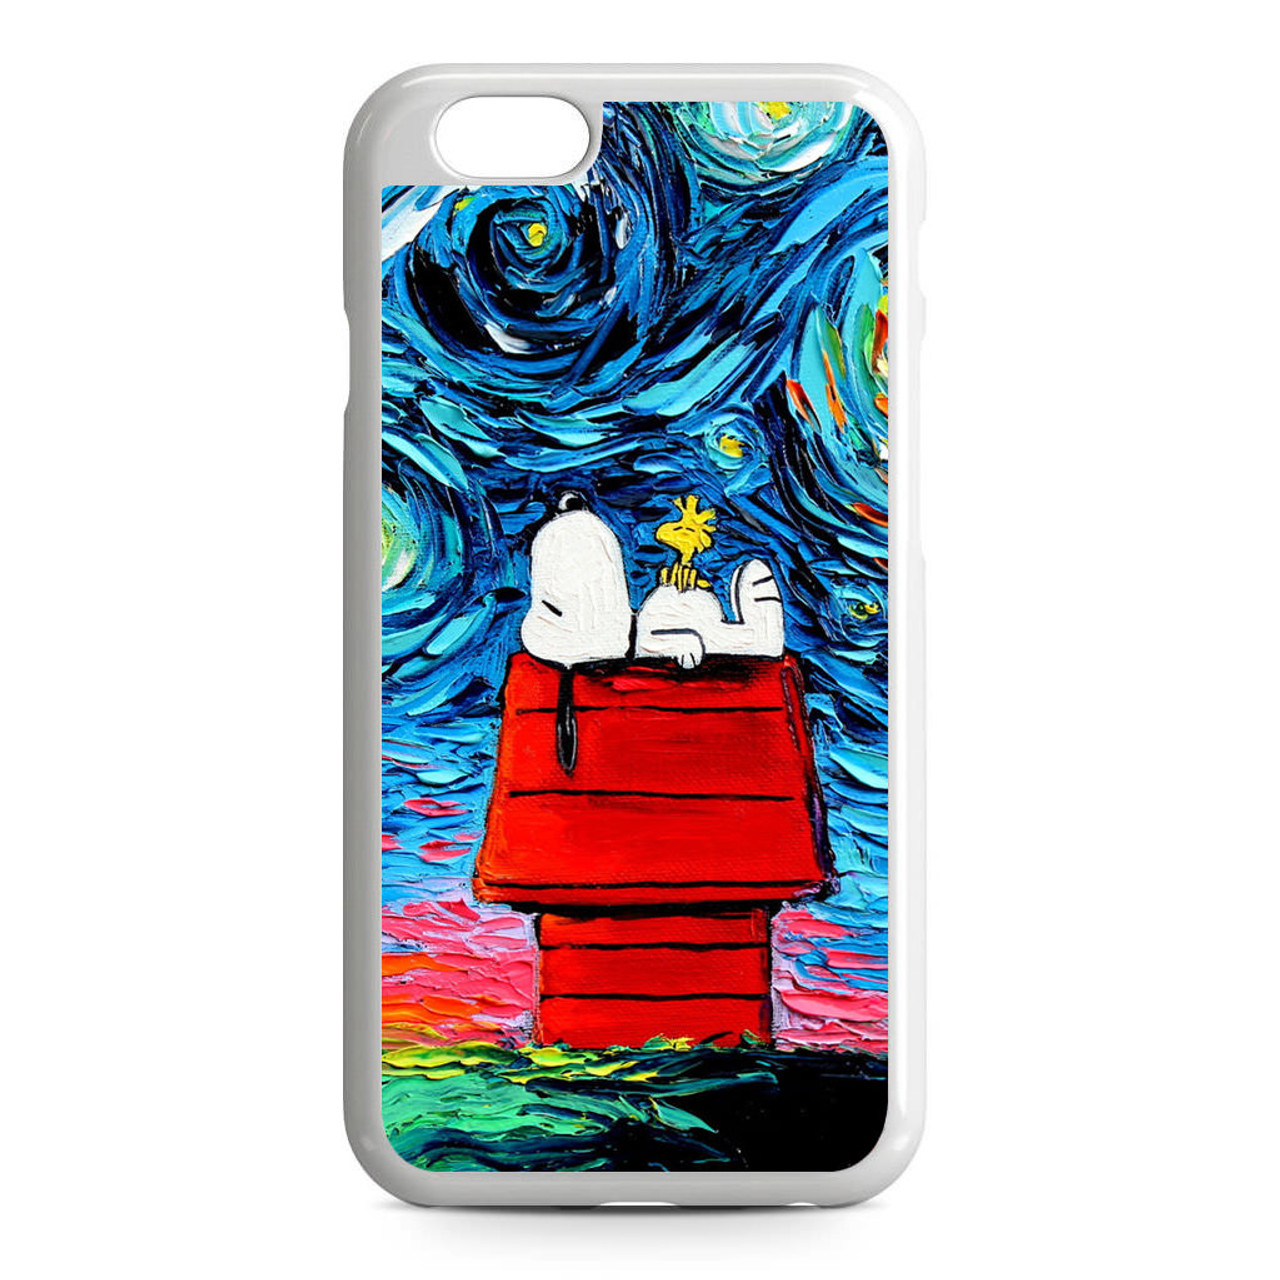 Snoopy Starry Night Van Gogh iPhone 6/6S Case